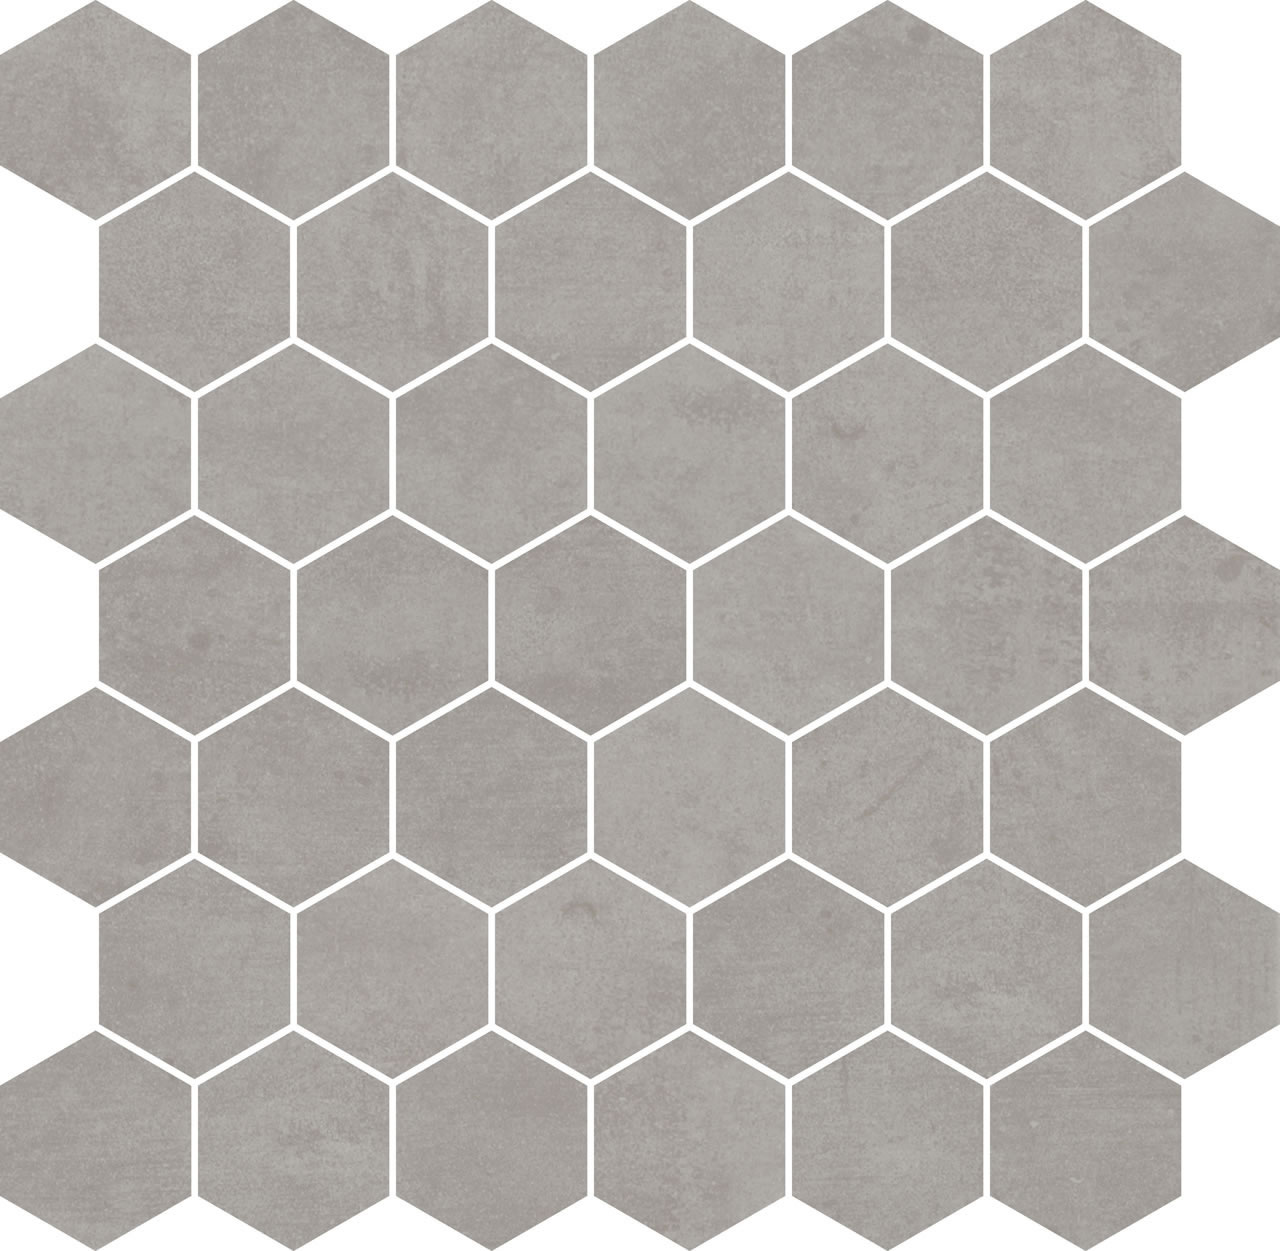 elemento T-3000 ac hexagonal gris